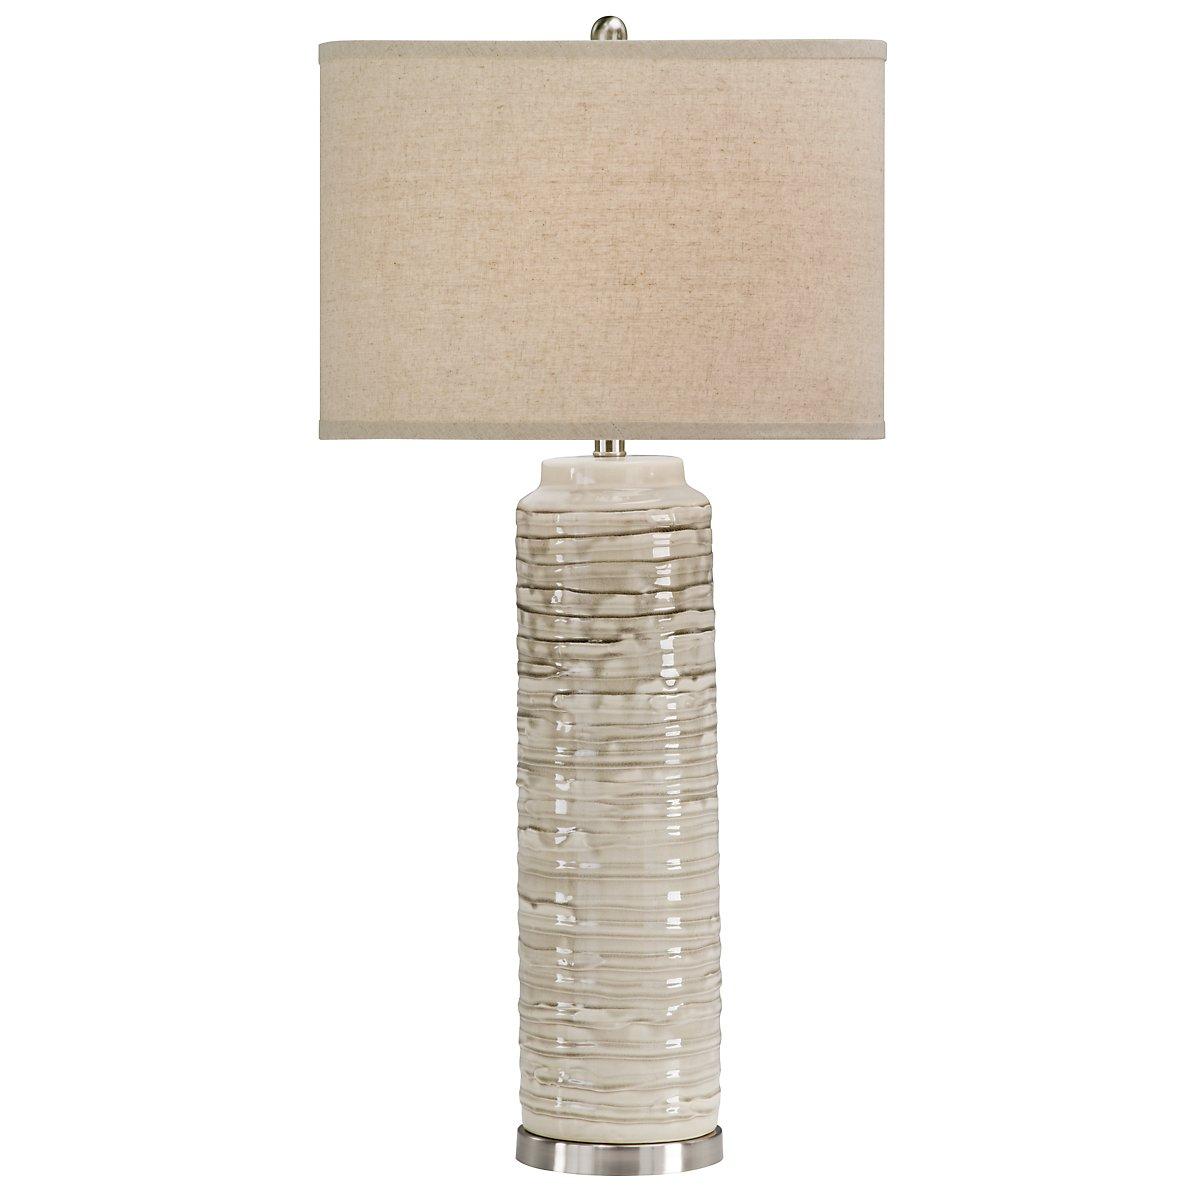 Anastasia Light Beige Ceramic Table Lamp